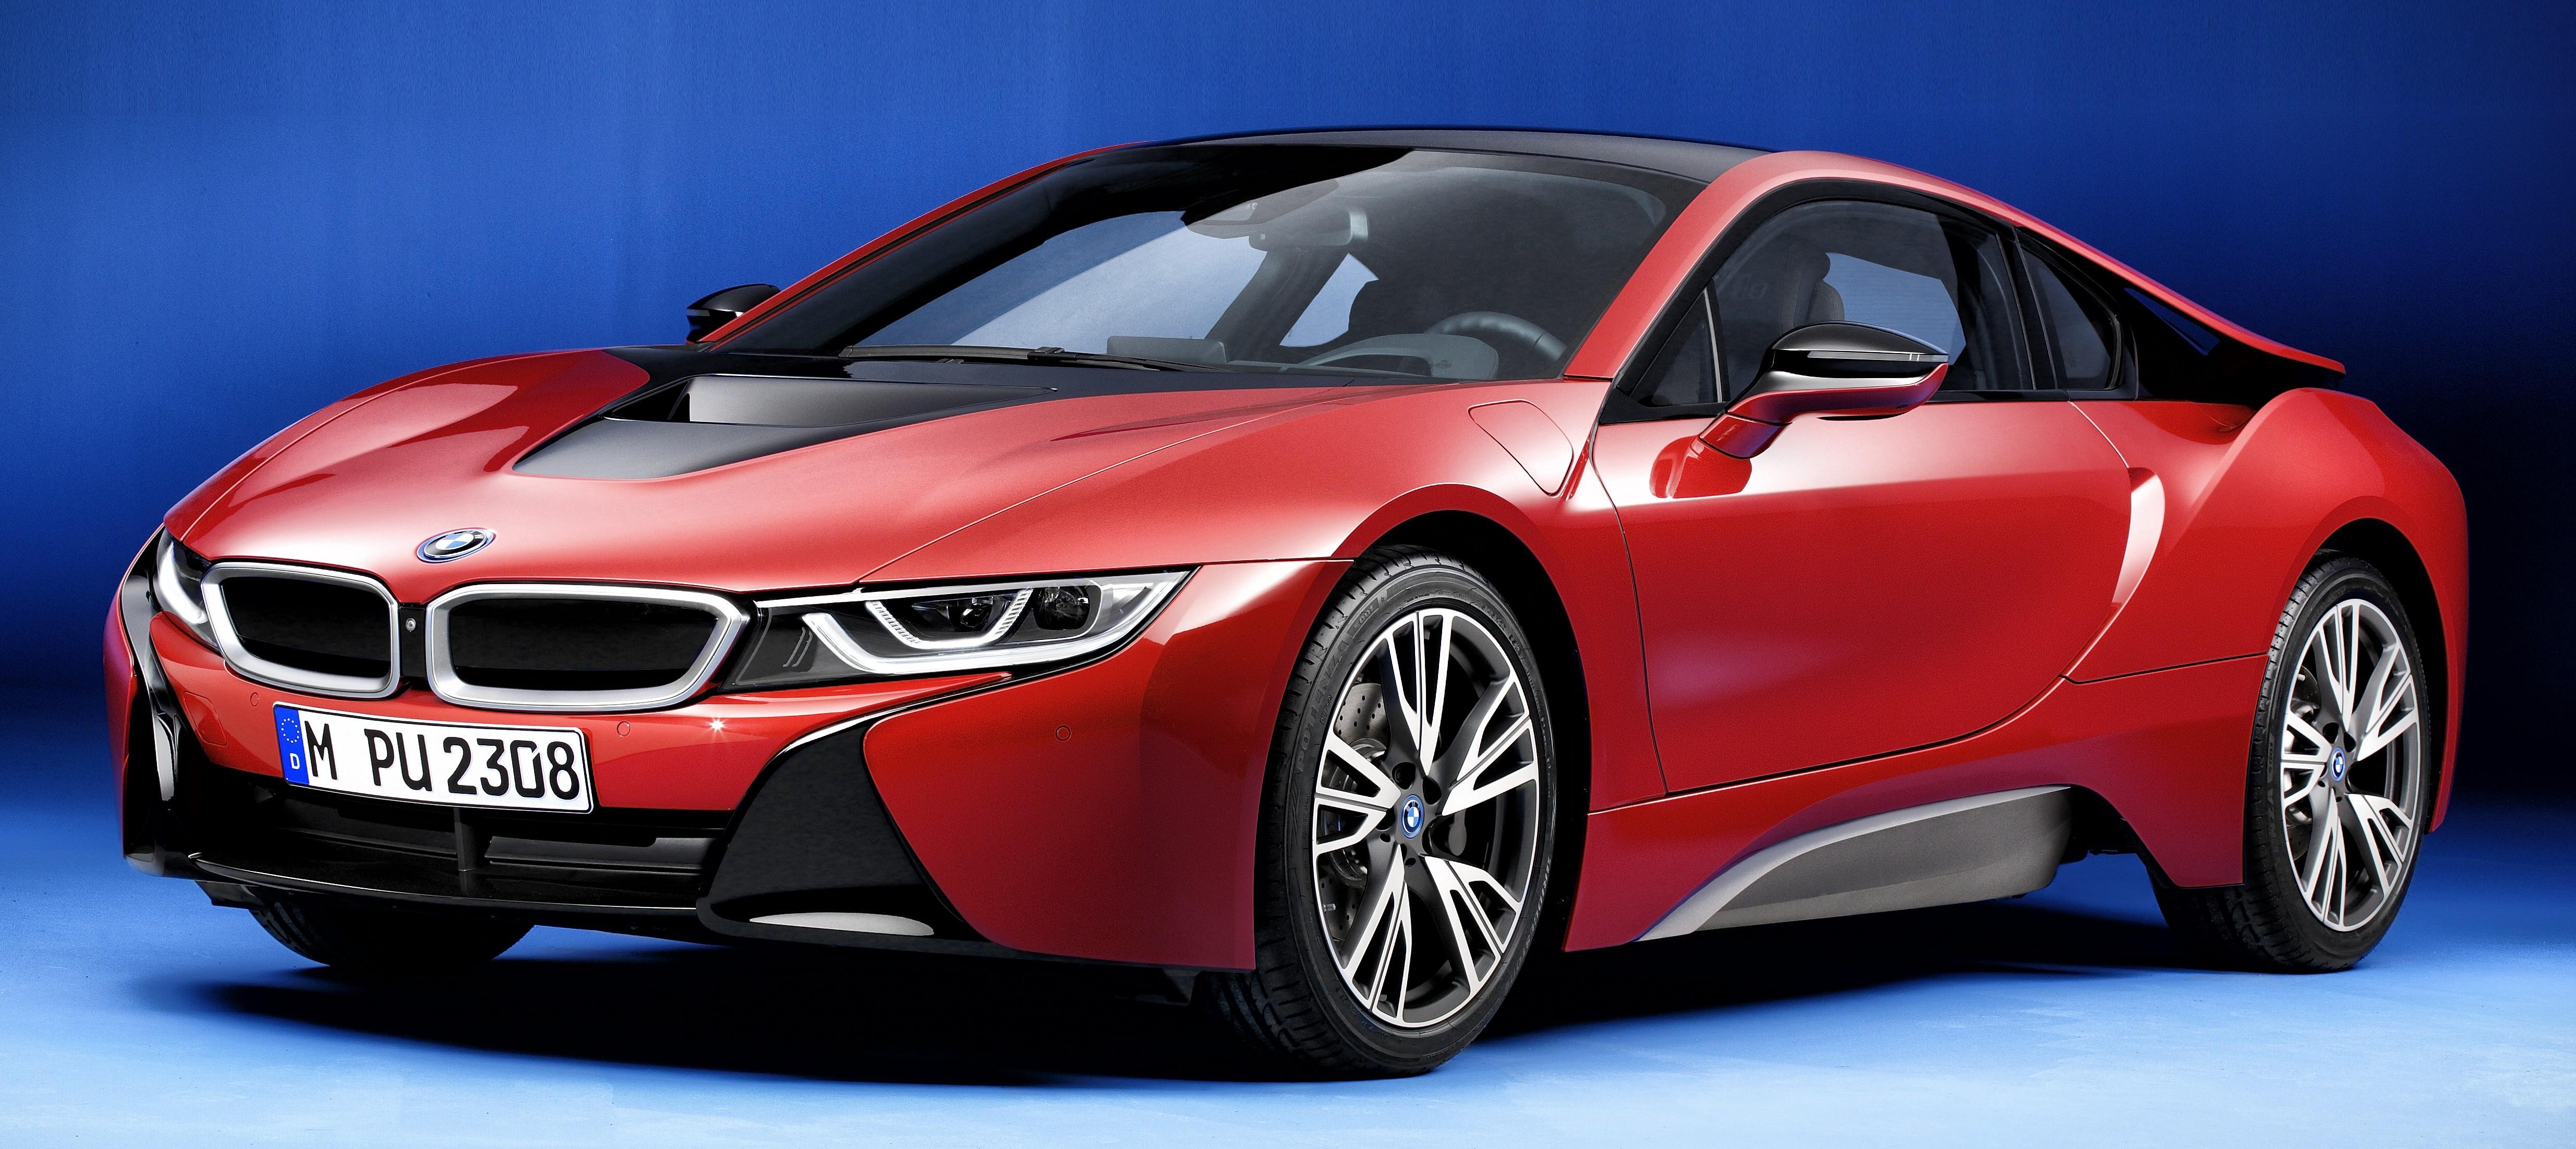 Bmw I8 Protonic Red Edition Heads To Geneva 2016 Paul Tan